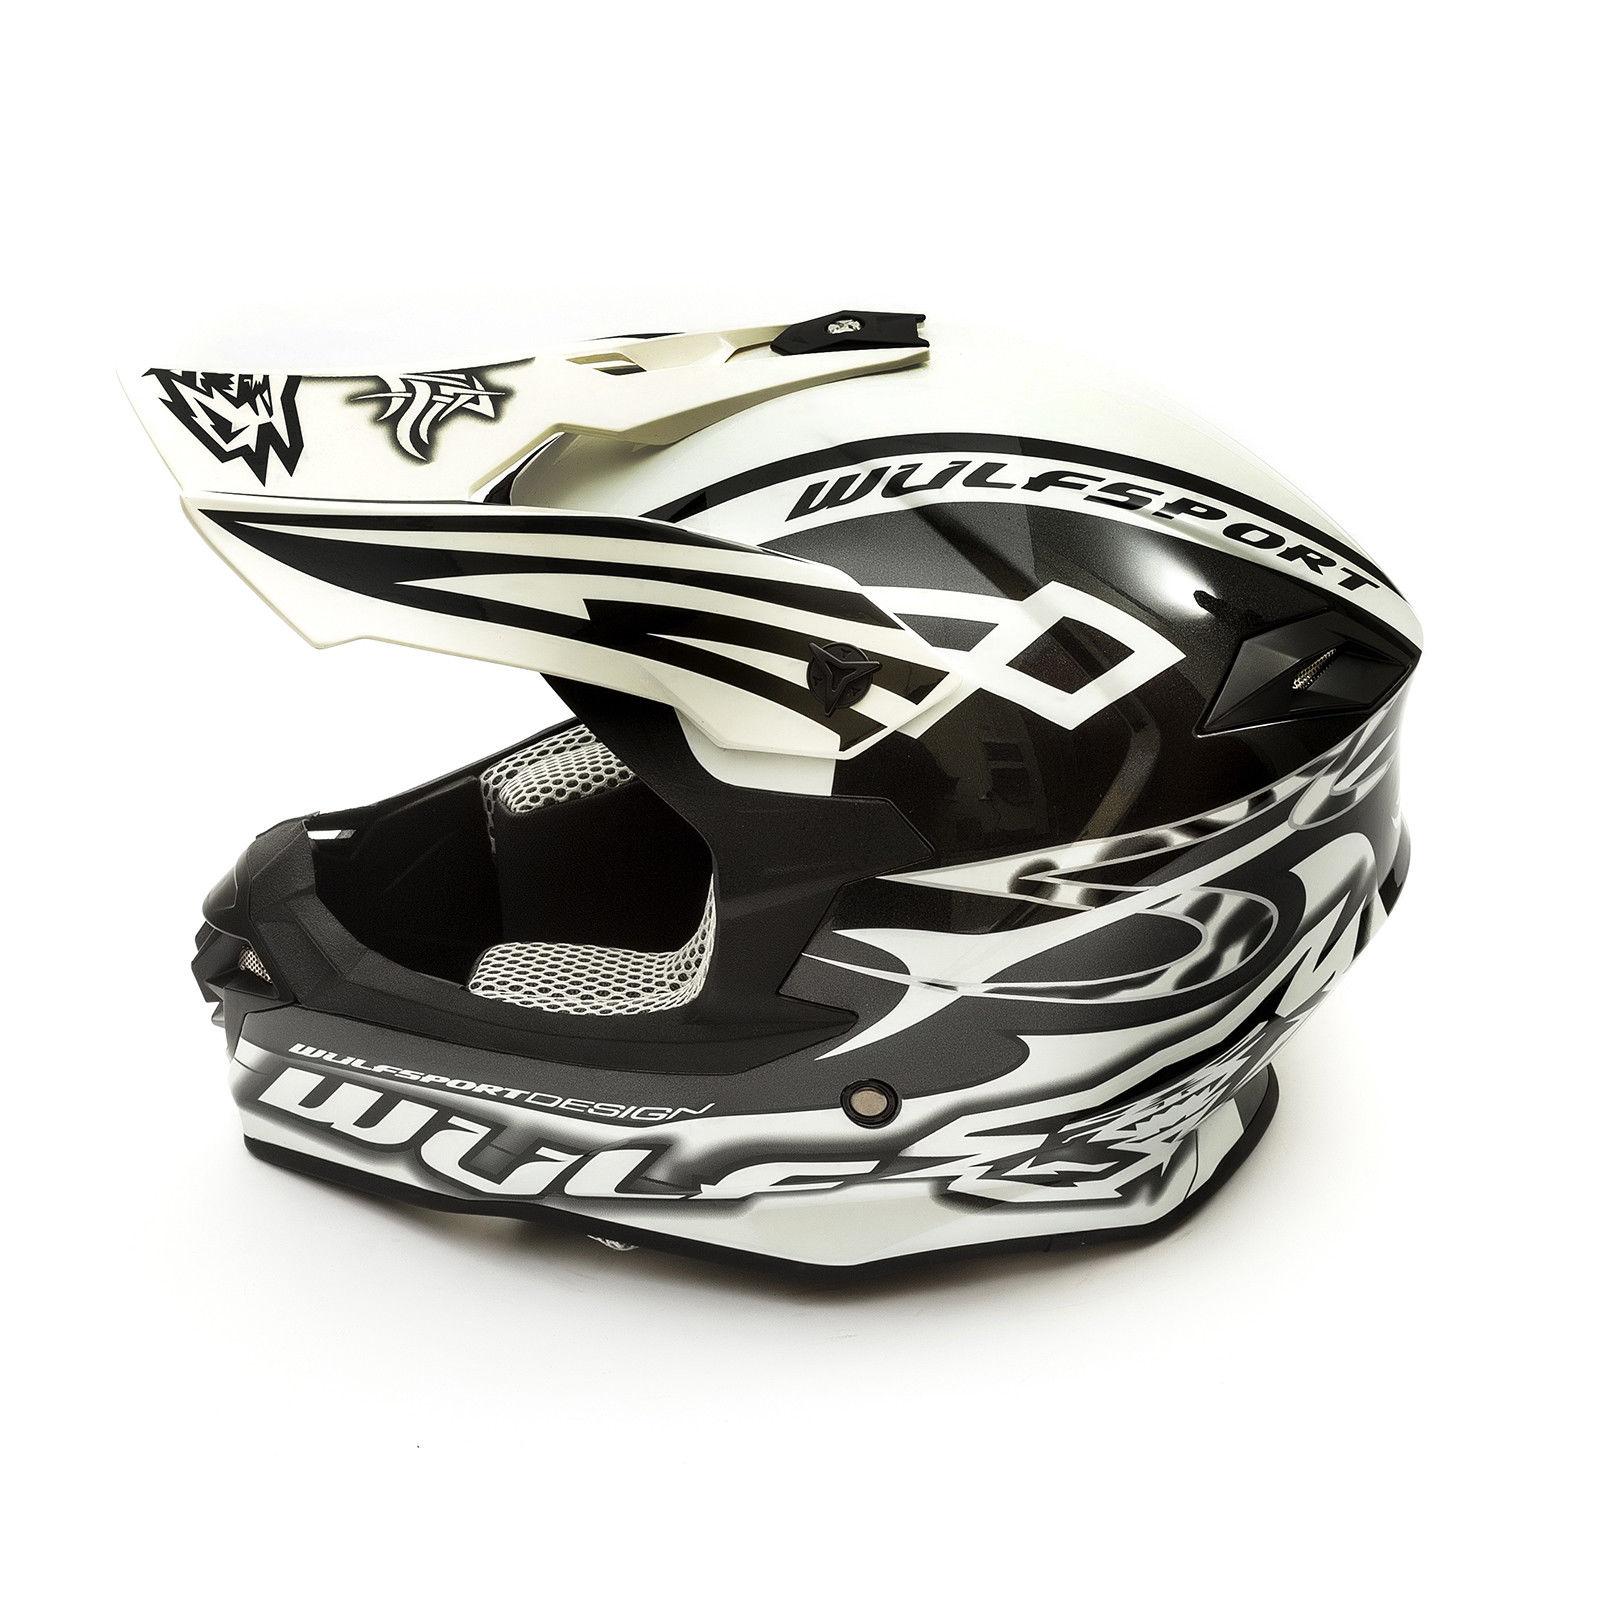 Wulfsport-Adult-Sceptre-Helmets-Motocross-Pitbike-Motorbike-Off-Road-Racing-ATV thumbnail 52